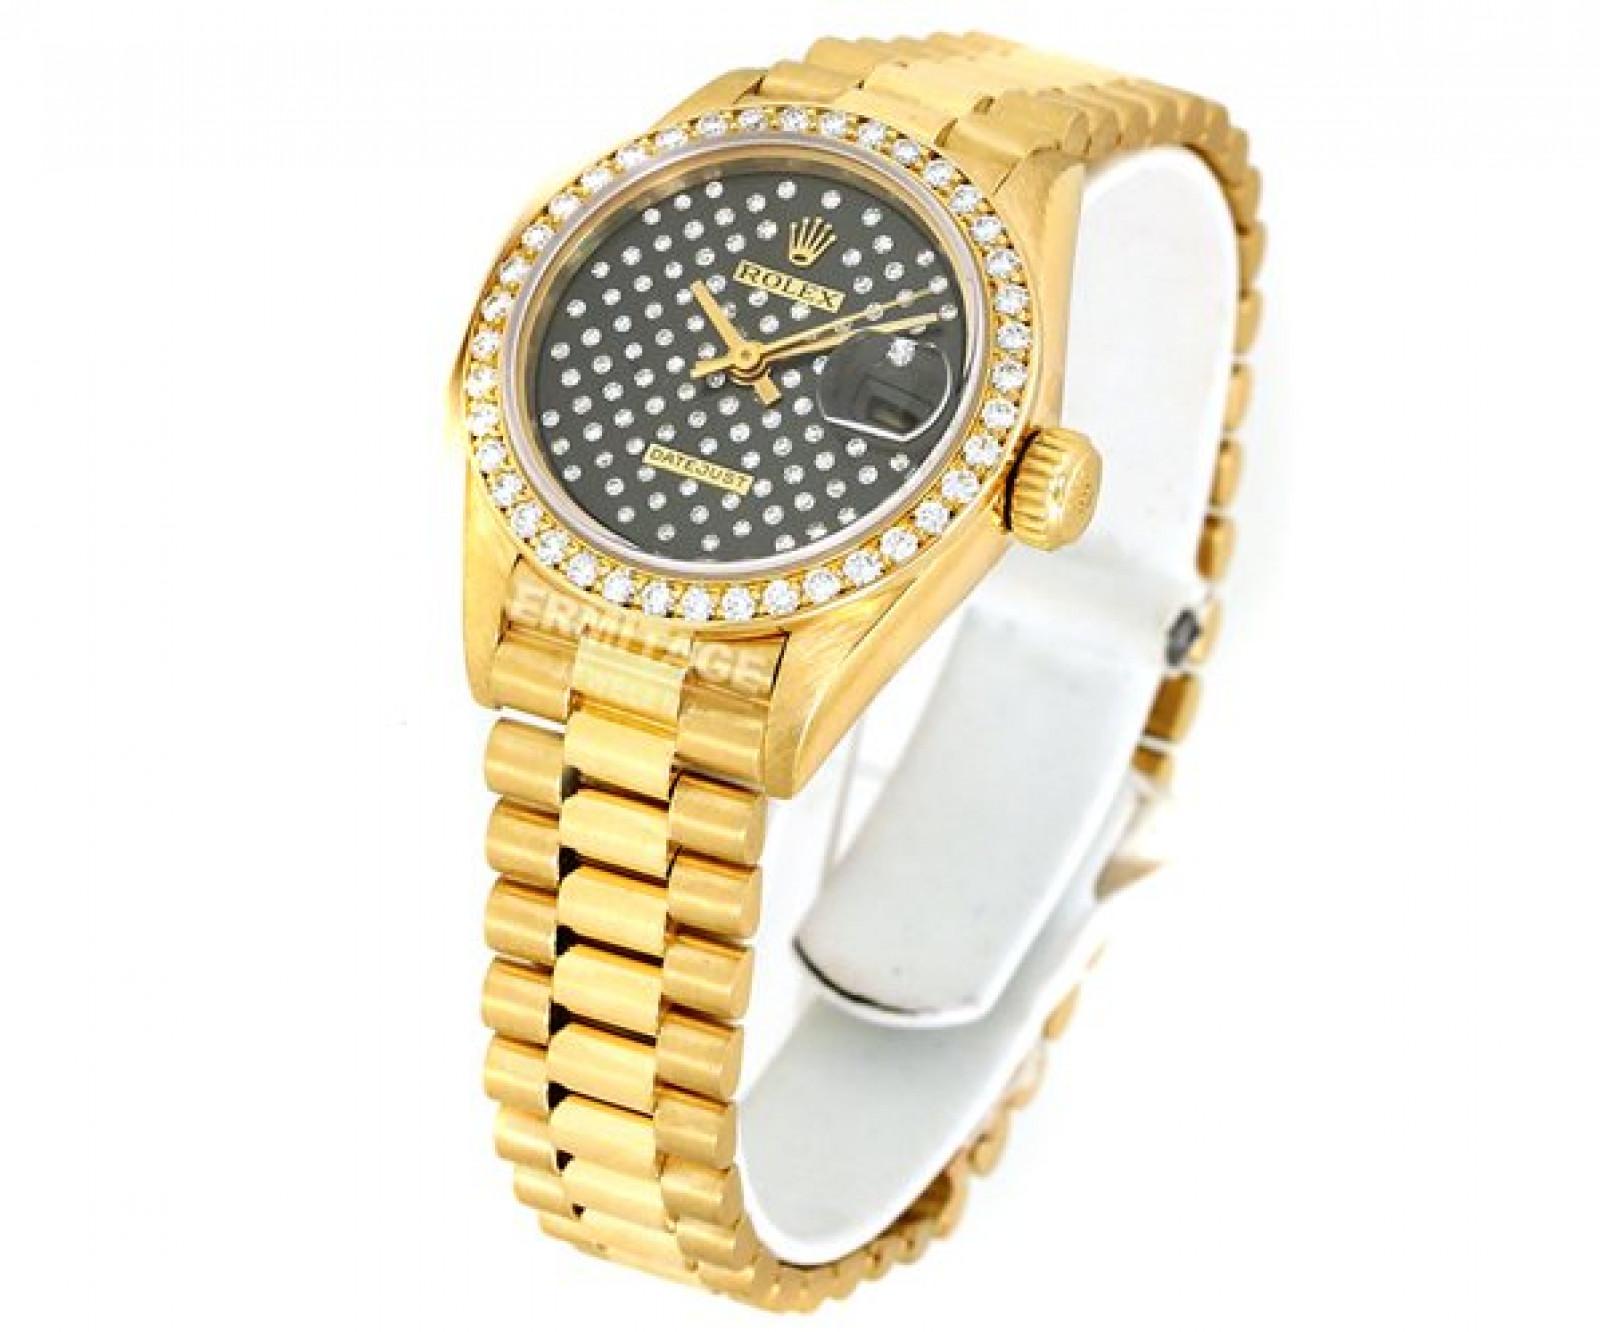 Black Diamond Bezel & Dial Rolex Datejust 69138